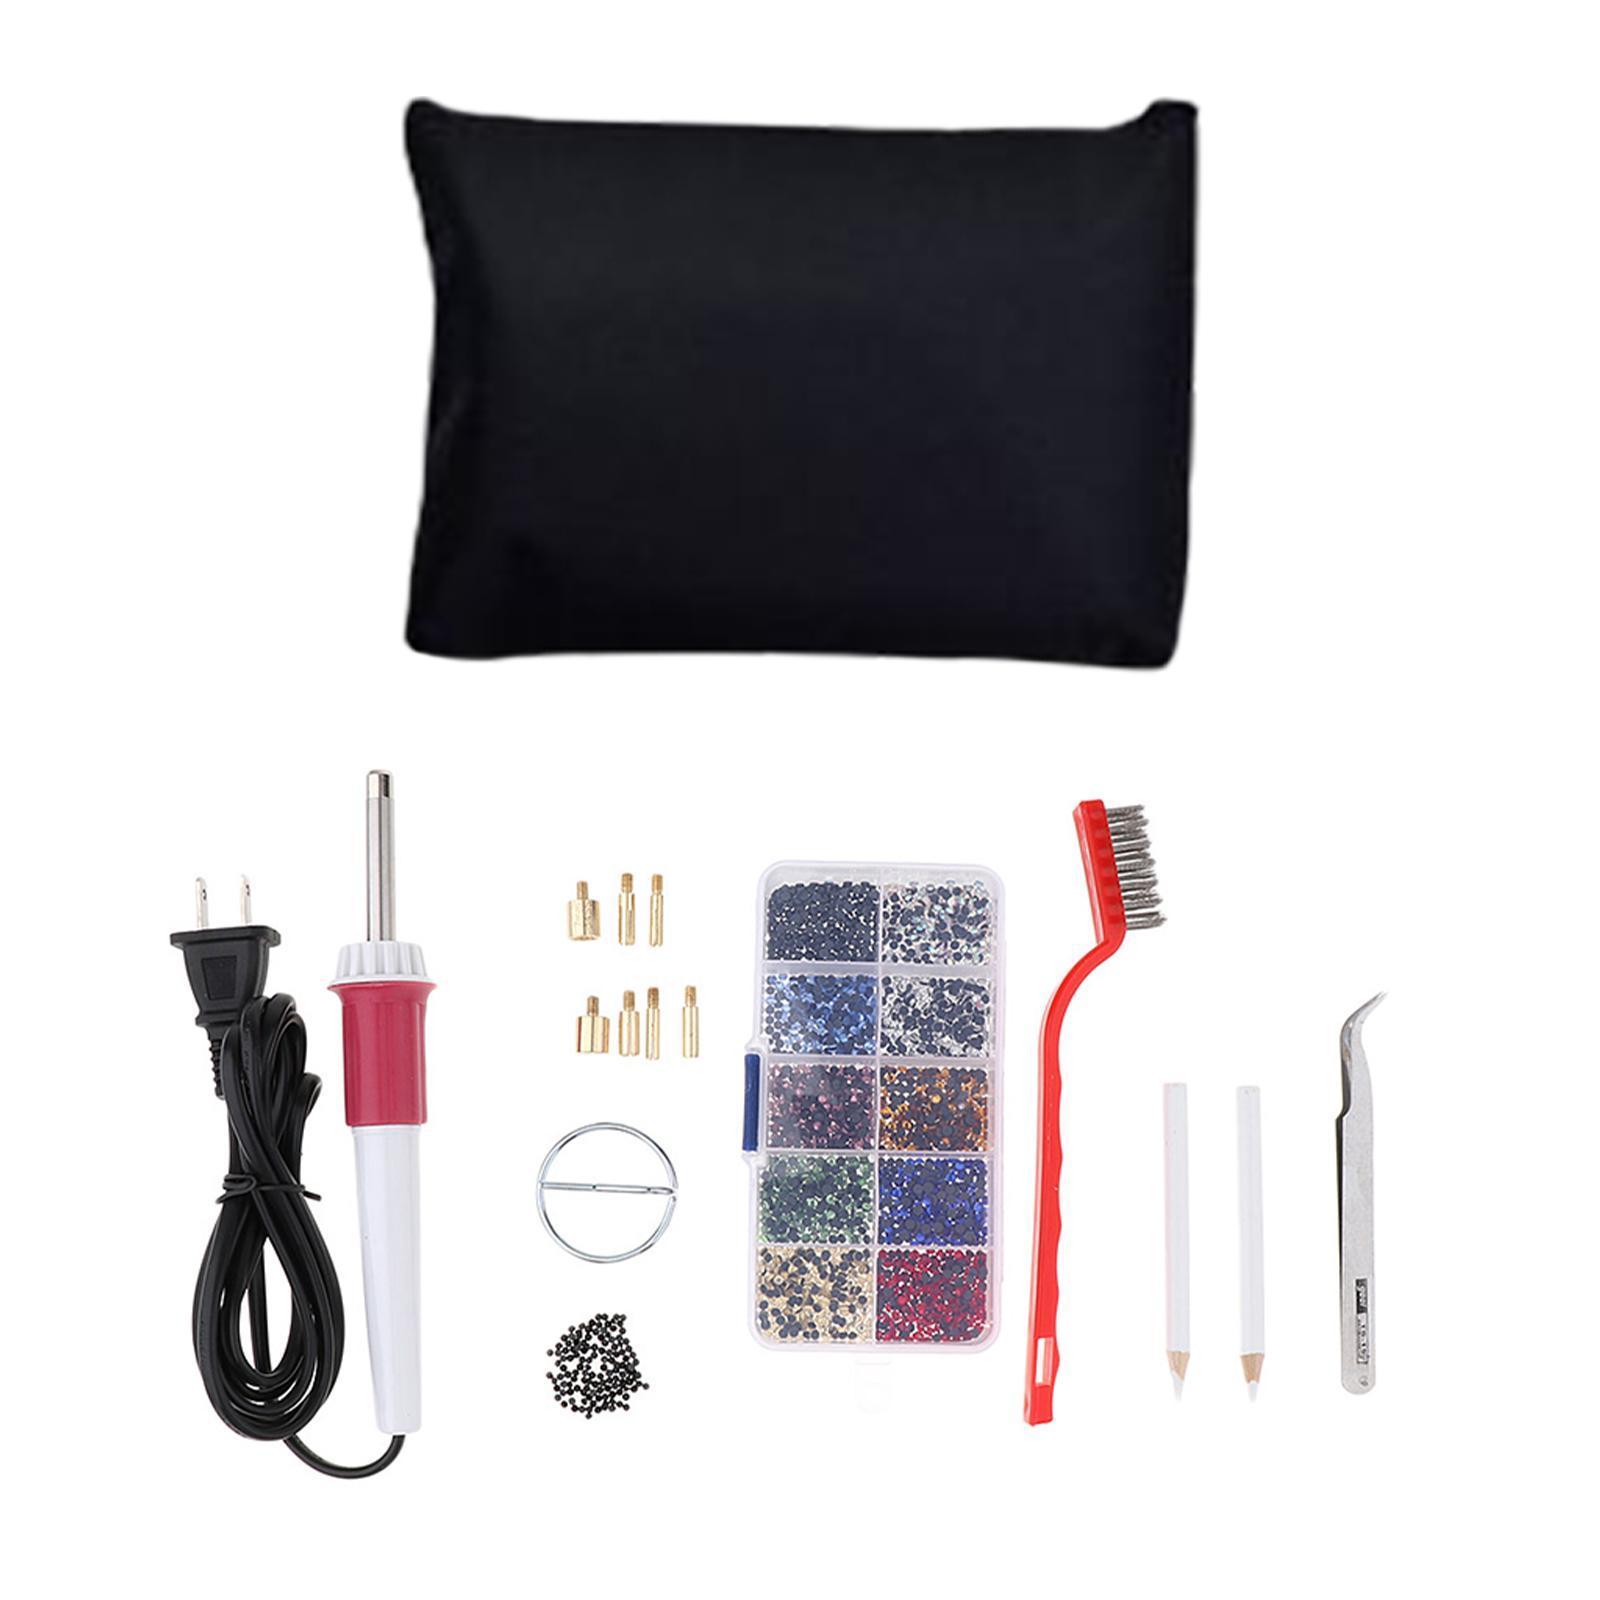 Iron-on Applicator Wand Heat Gun for Hot Fix Hotfix Rhinestone Crystal Tools